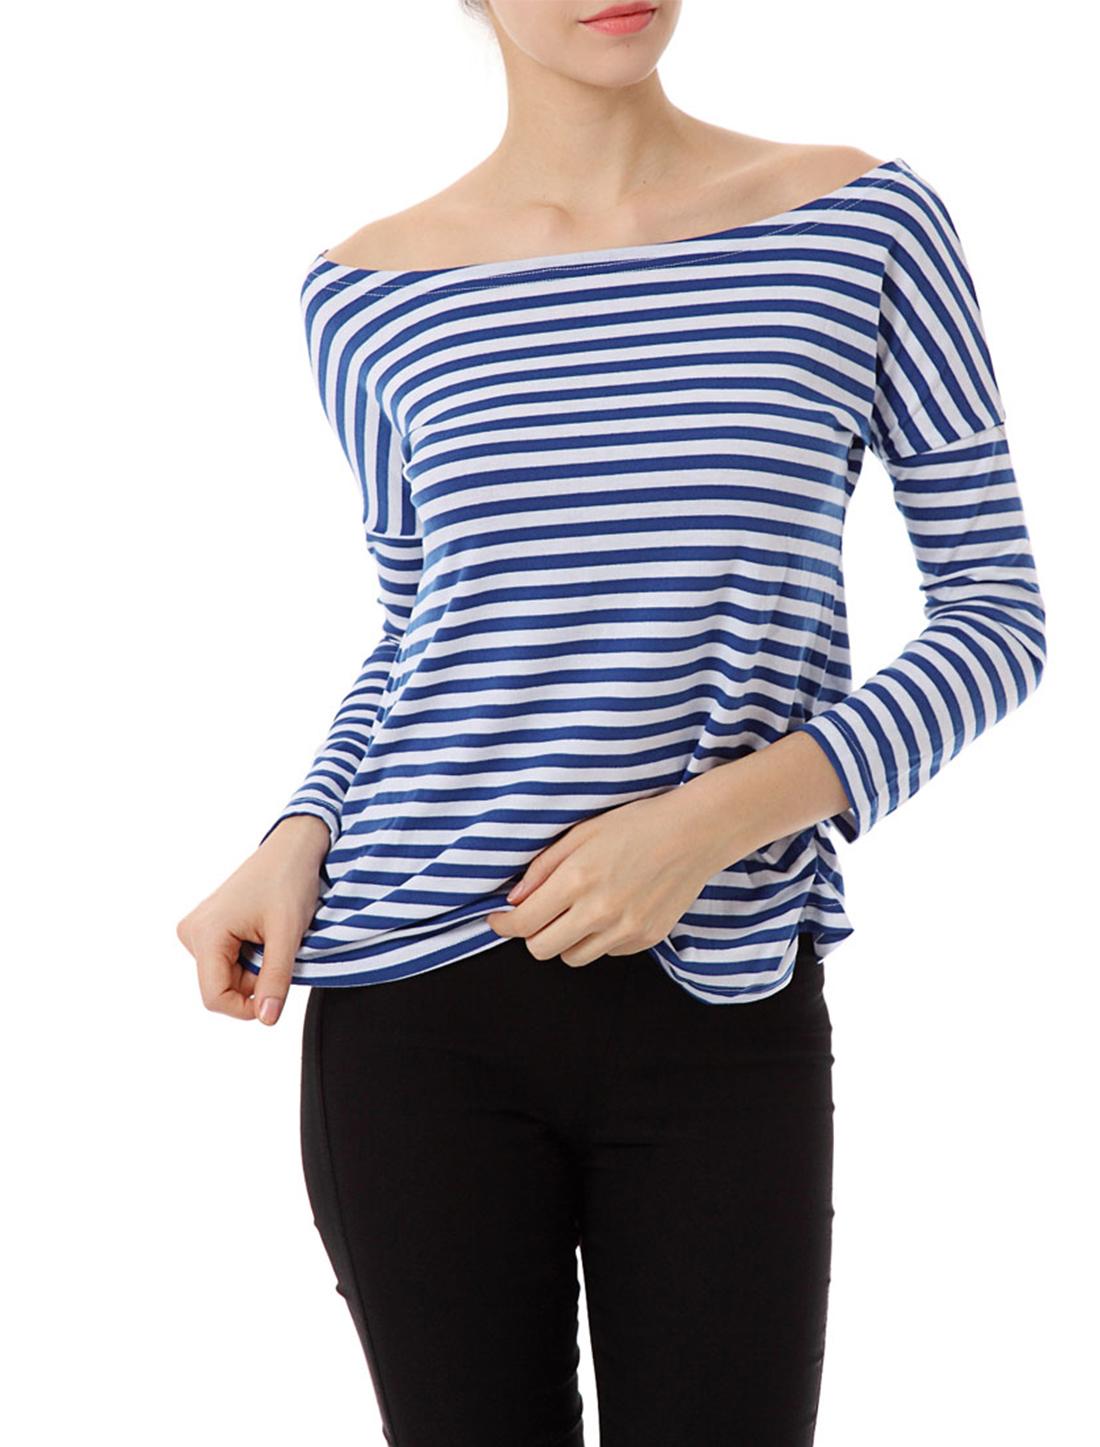 Woman Blue White Stripes Long Sleeve Shirt Tops M